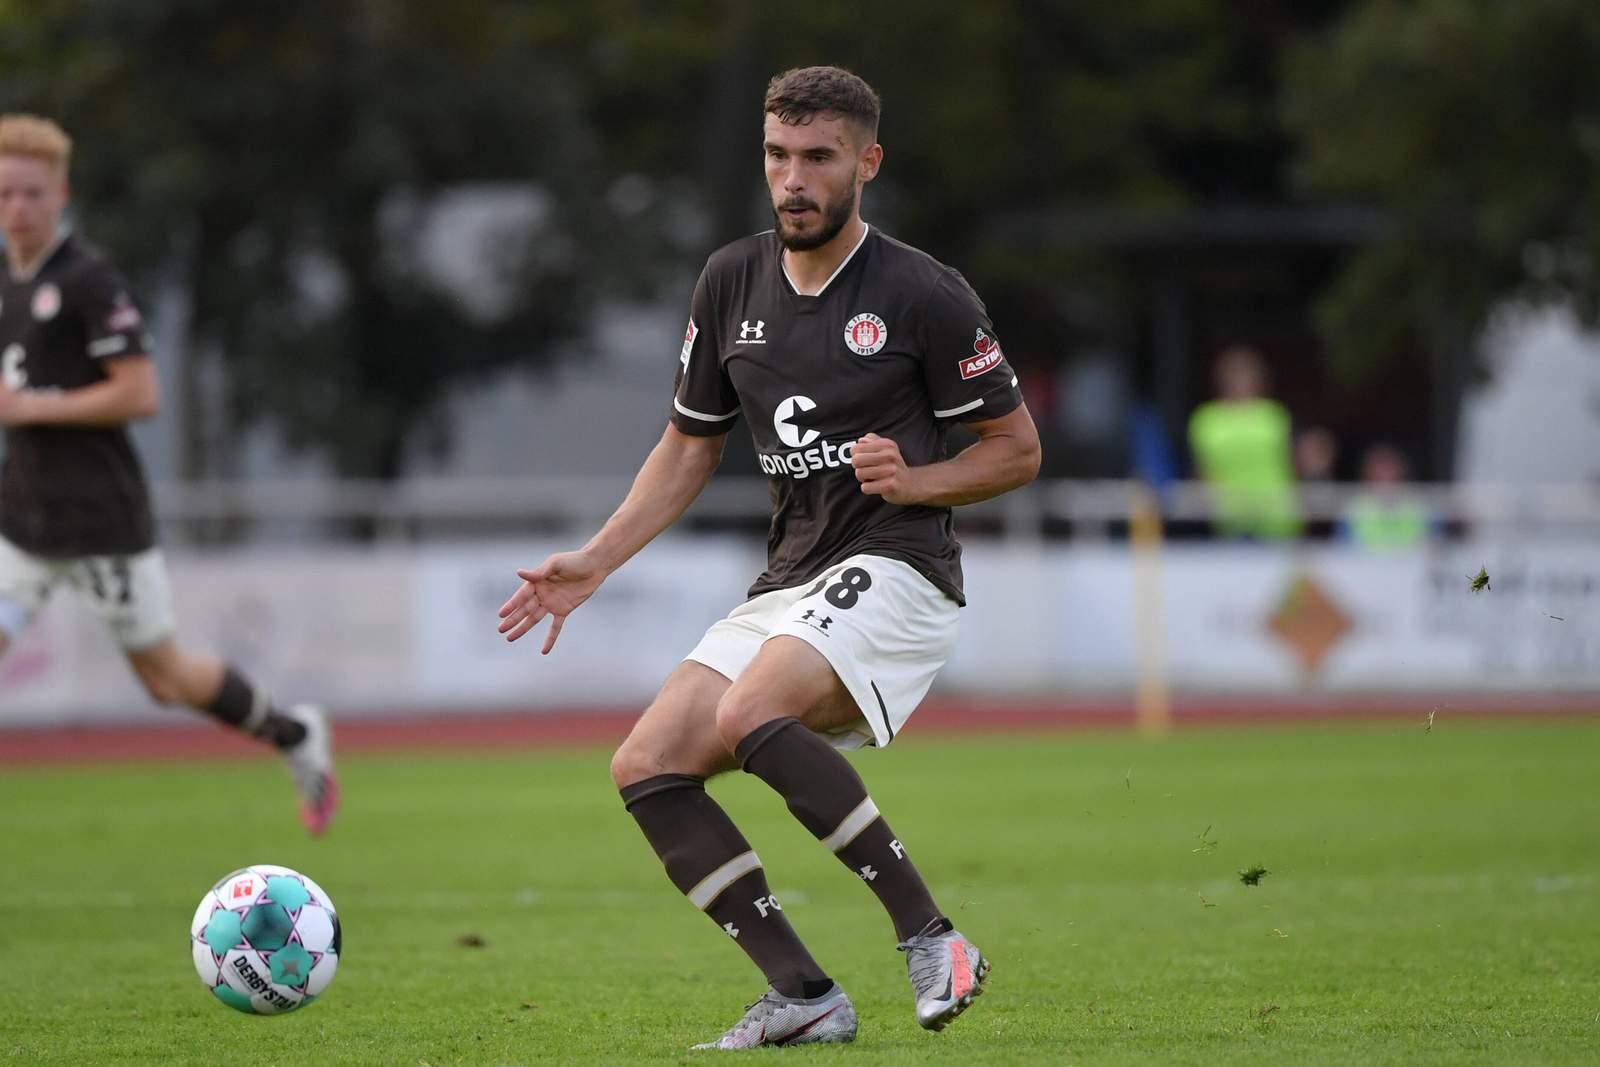 Christian Stark vom FC St. Pauli